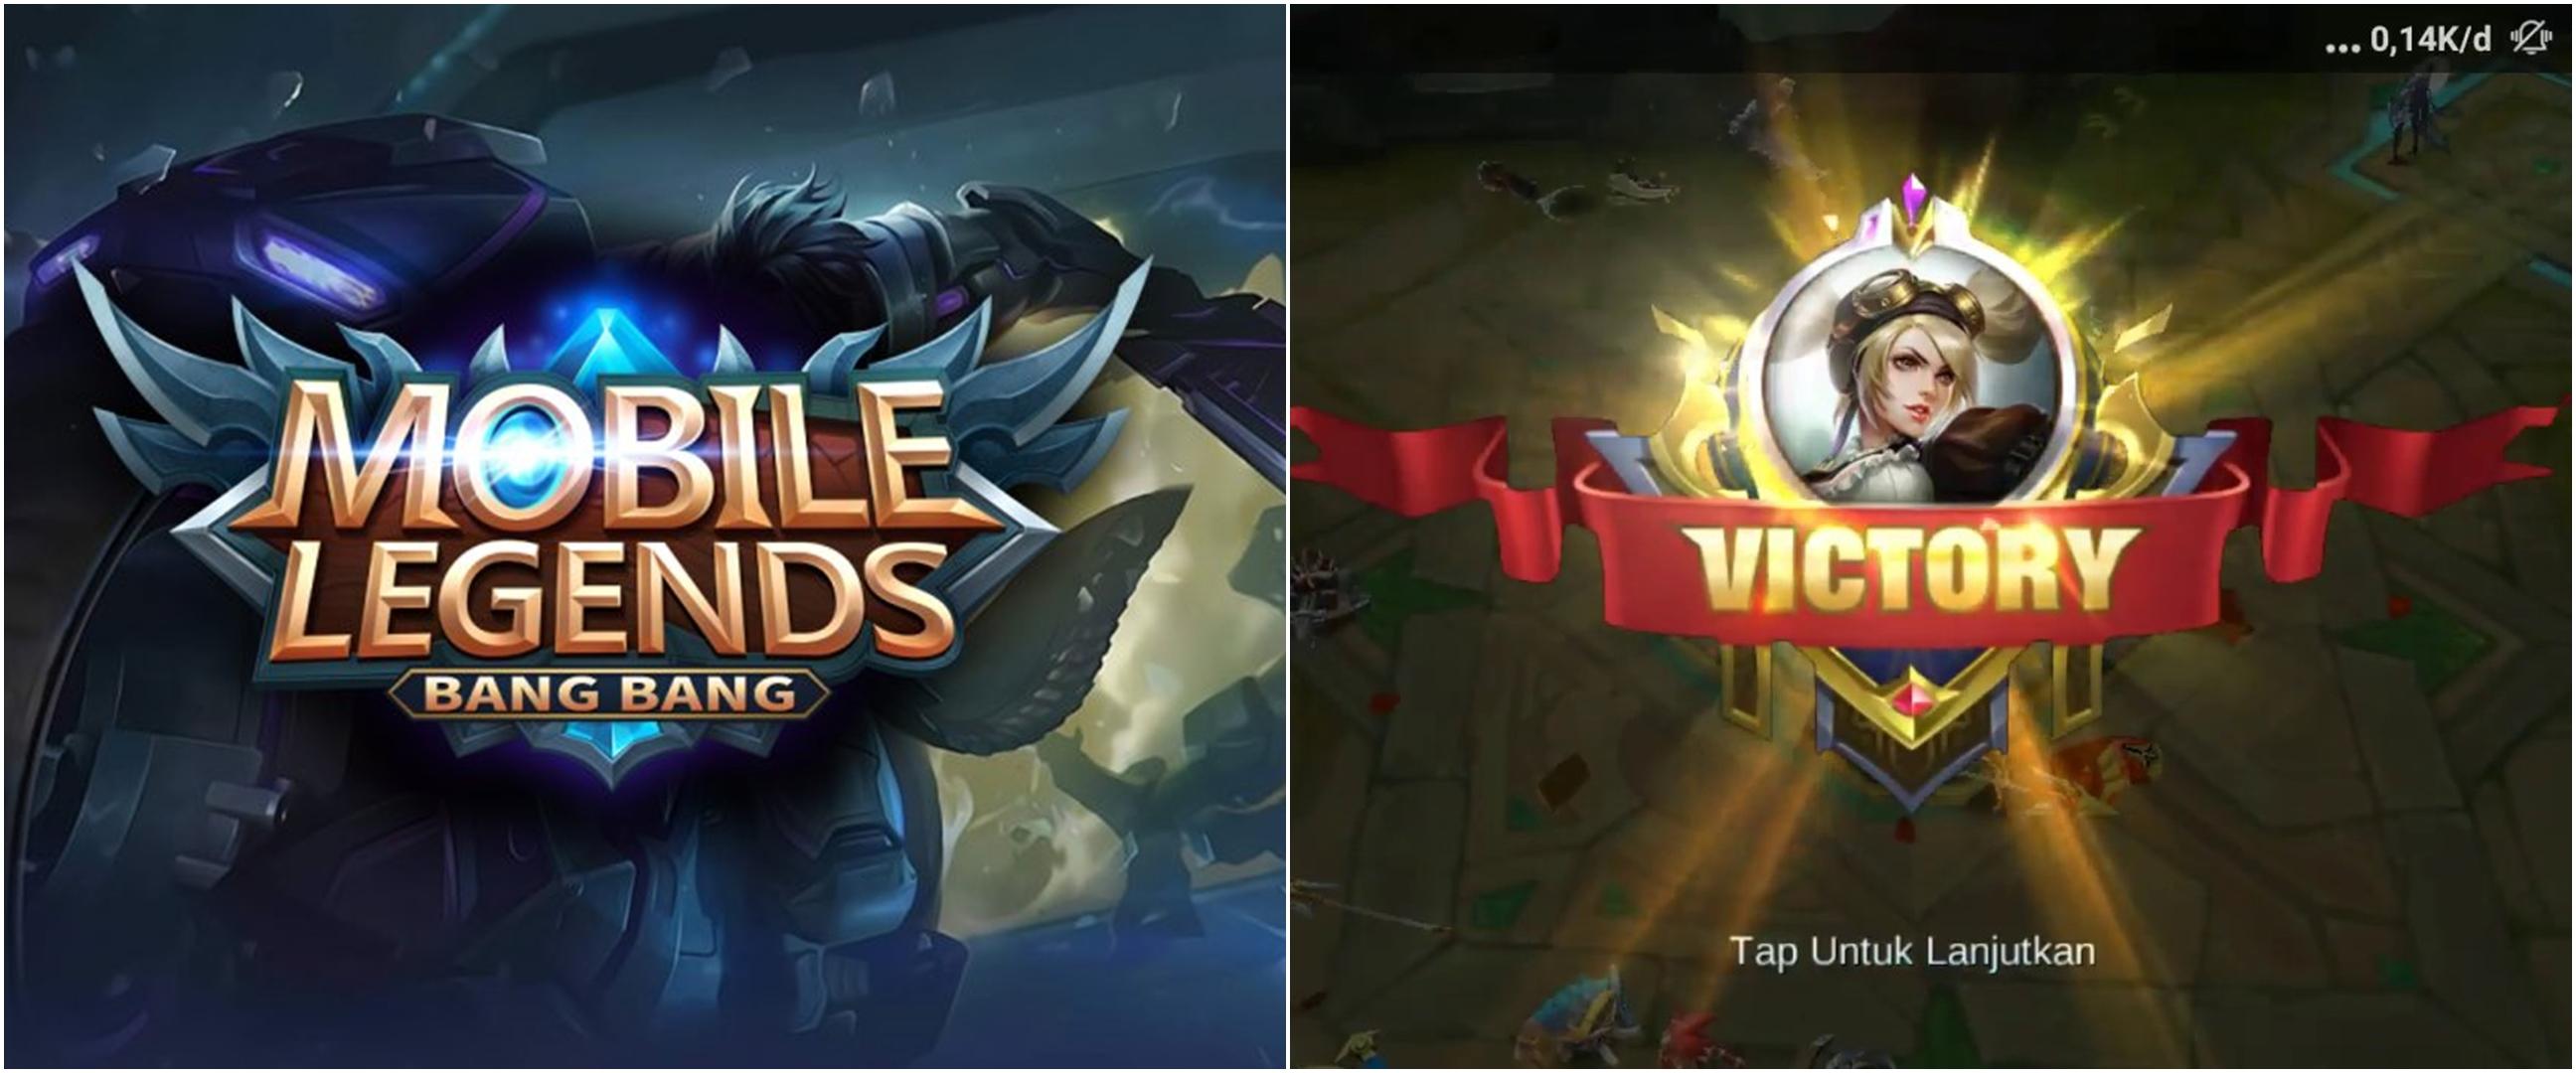 6 Cara cepat naik level di game Mobile Legends, bikin makin jago